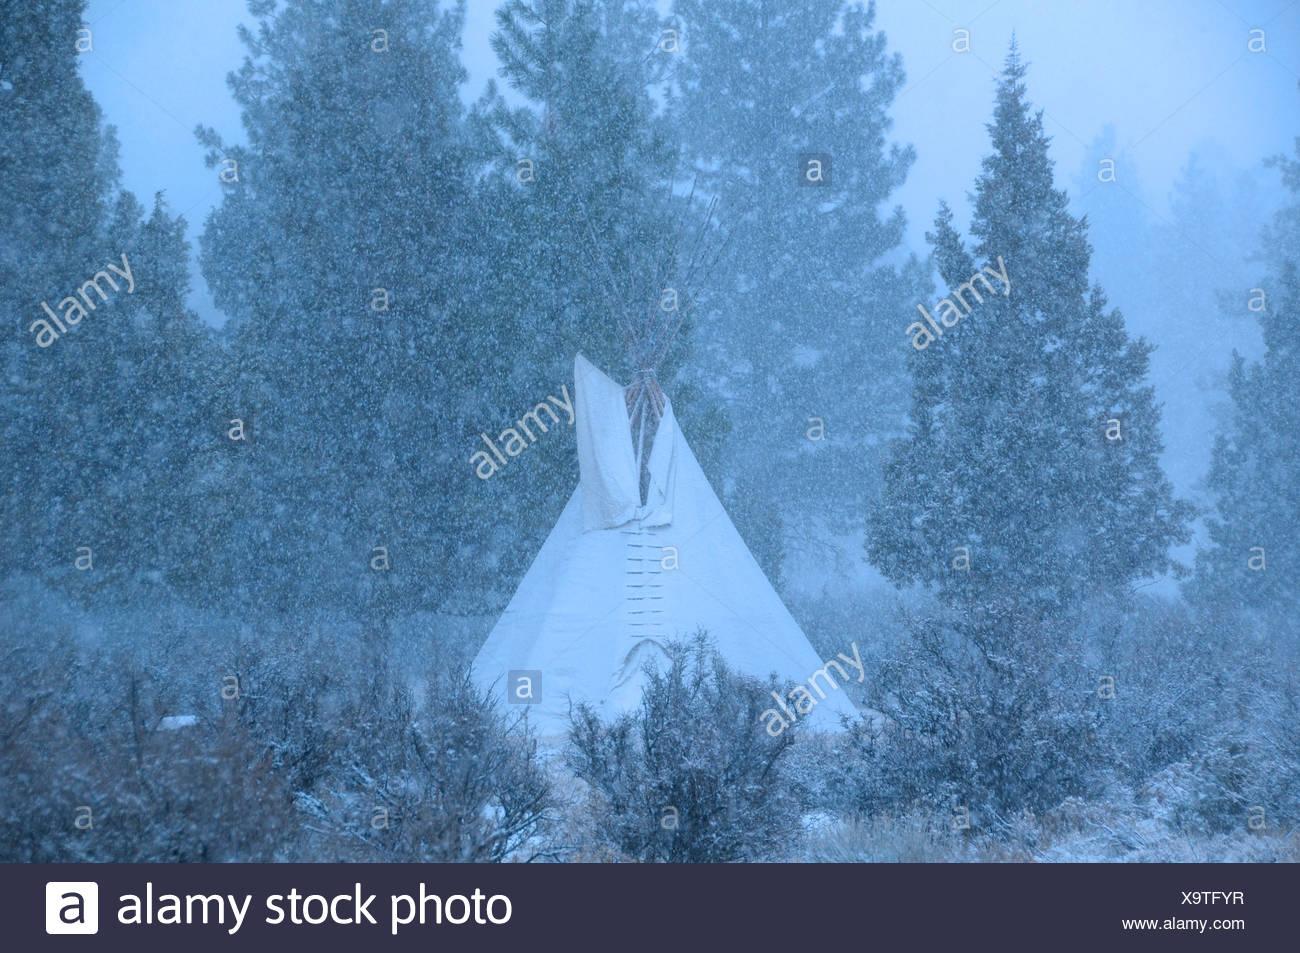 Tipi, snow, High Desert, Oregon, USA, United States, America, - Stock Image